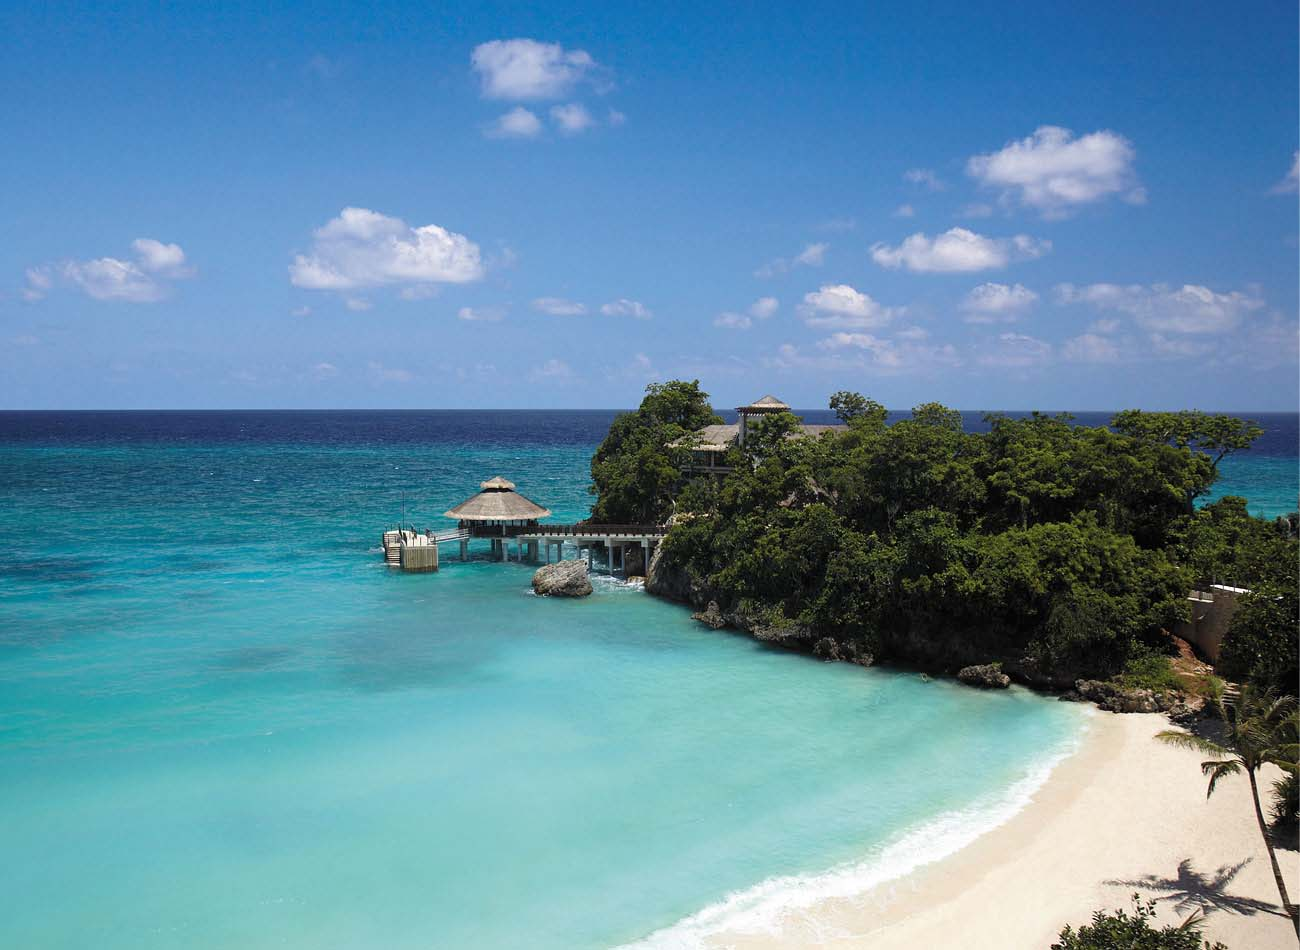 Shangri La Boracay S Punta Bunga Beach Island